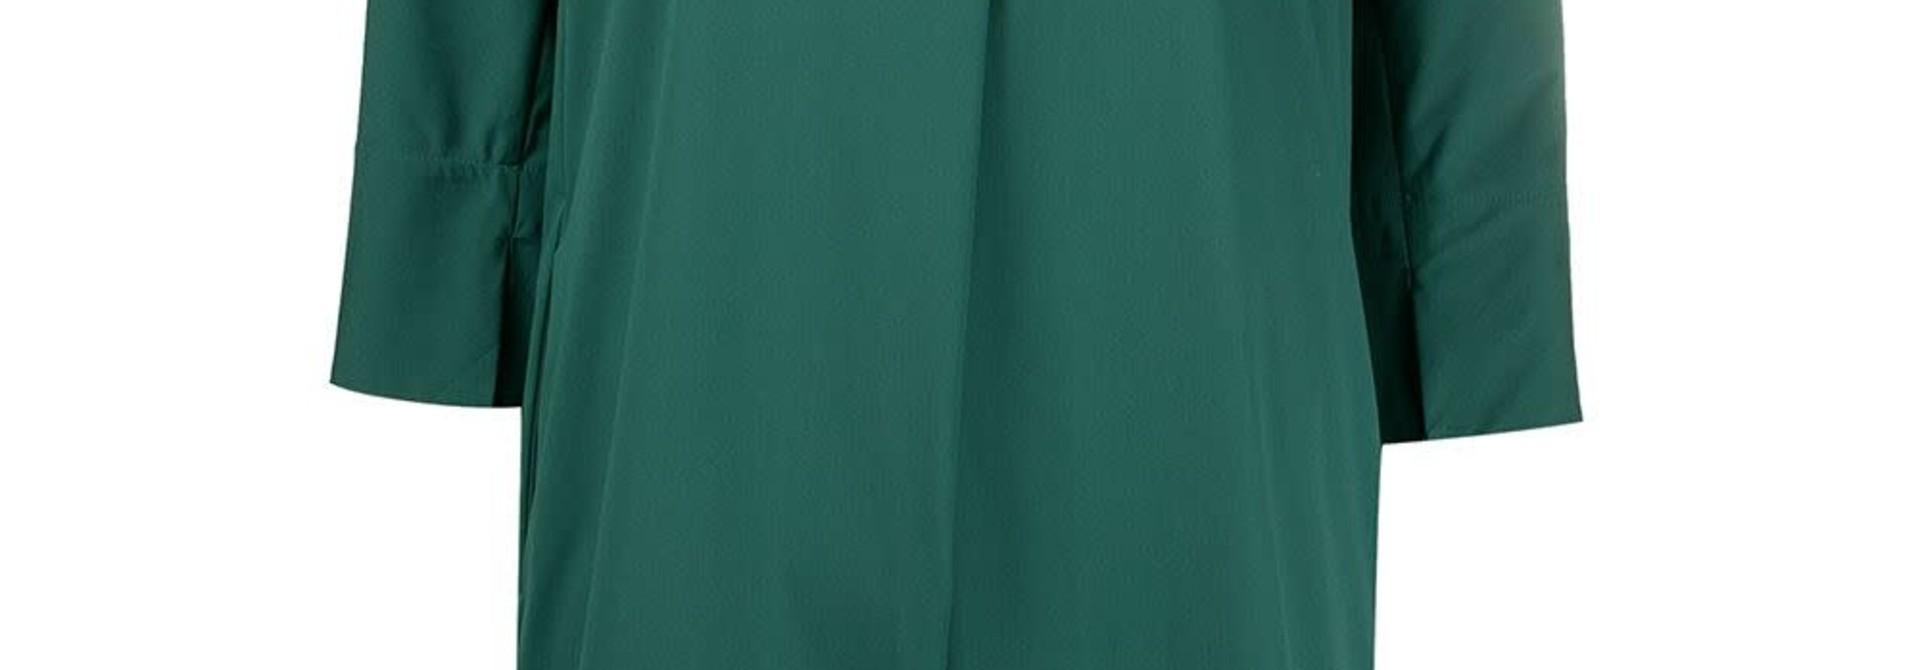 Melania dress antonelli